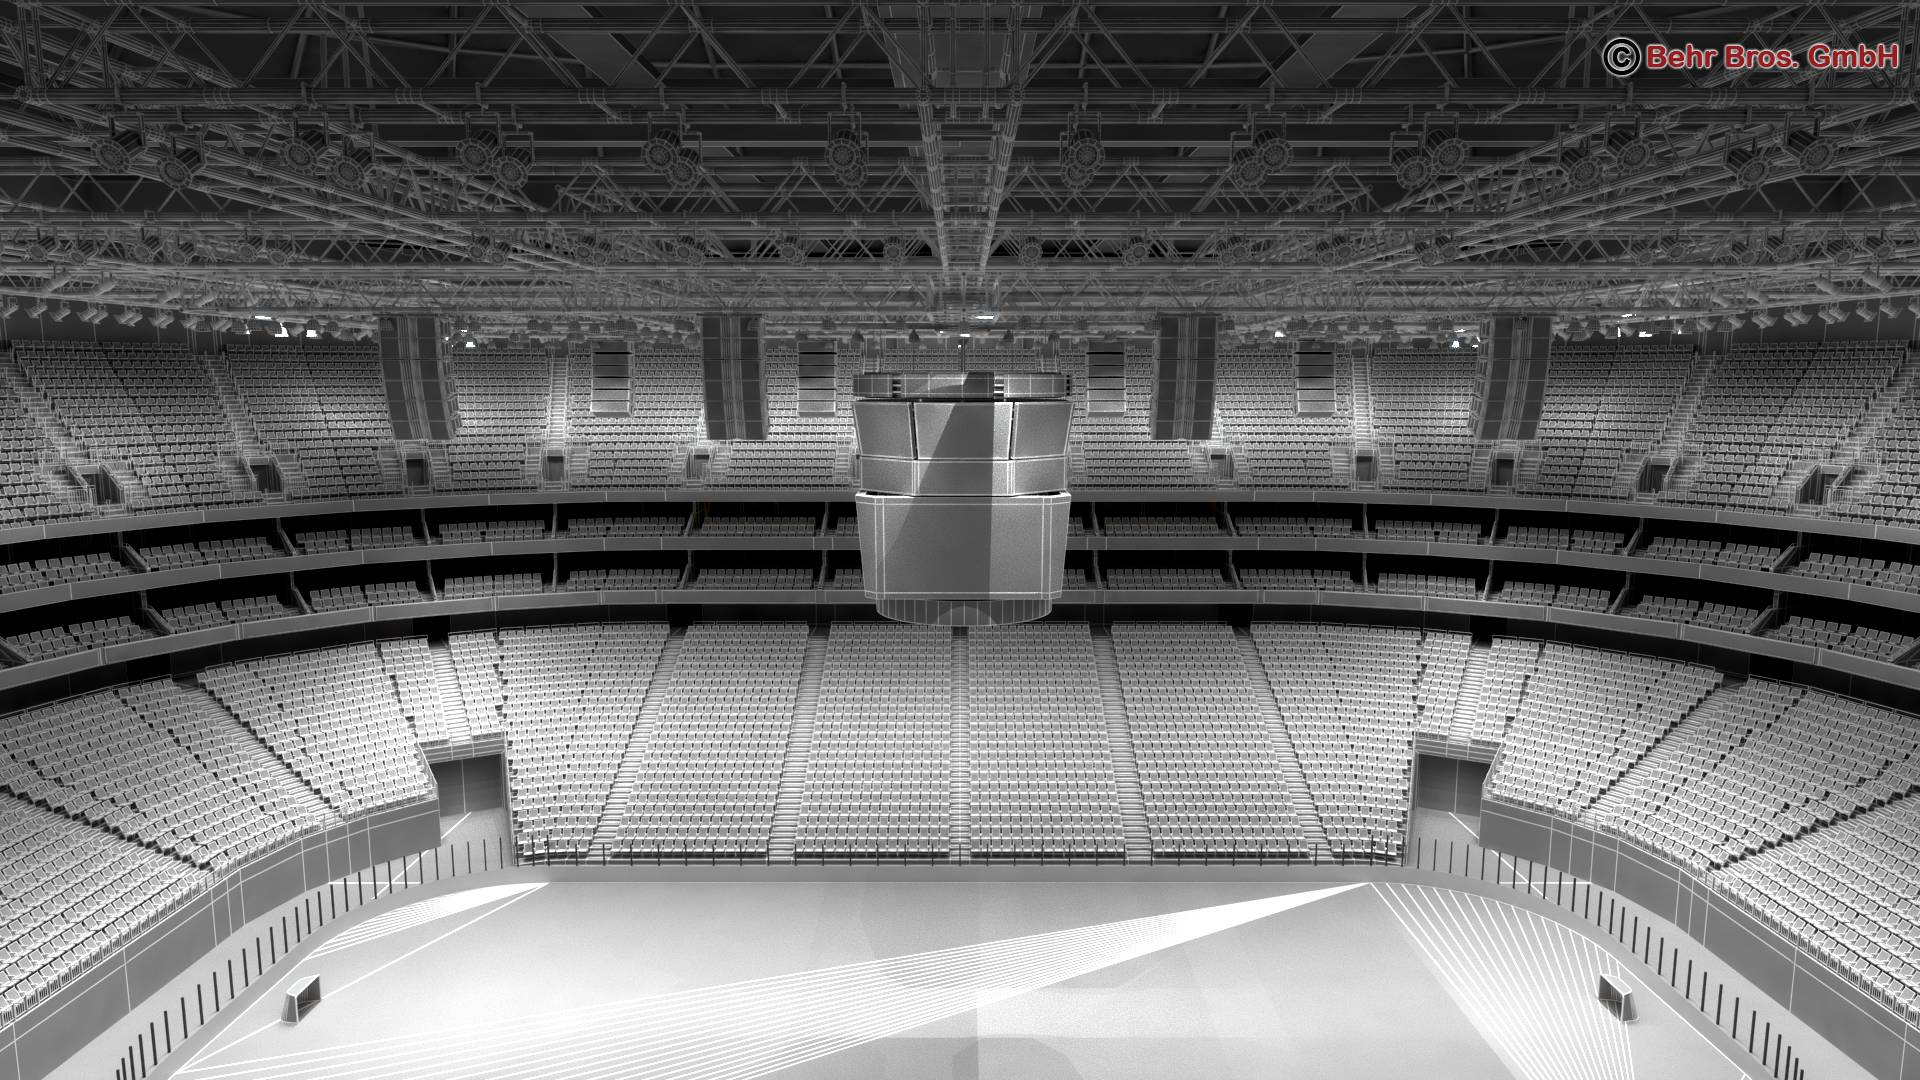 ice hockey arena v2 3d model 3ds max fbx c4d lwo ma mb obj 251664